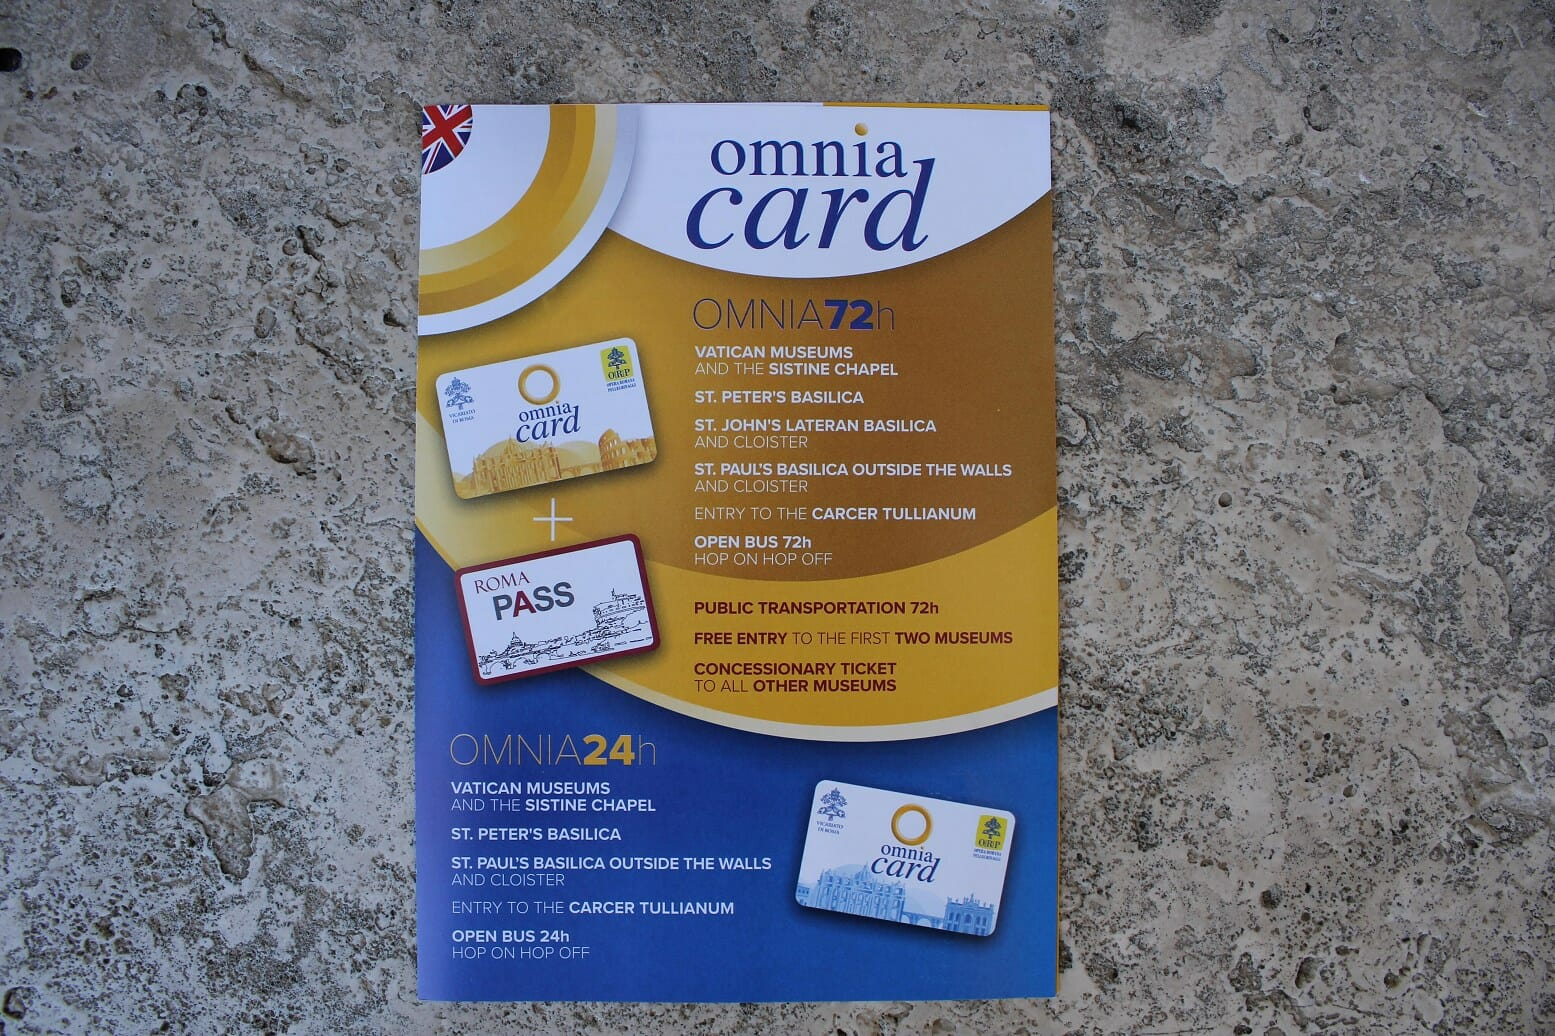 Roma pass cost omnia card rome